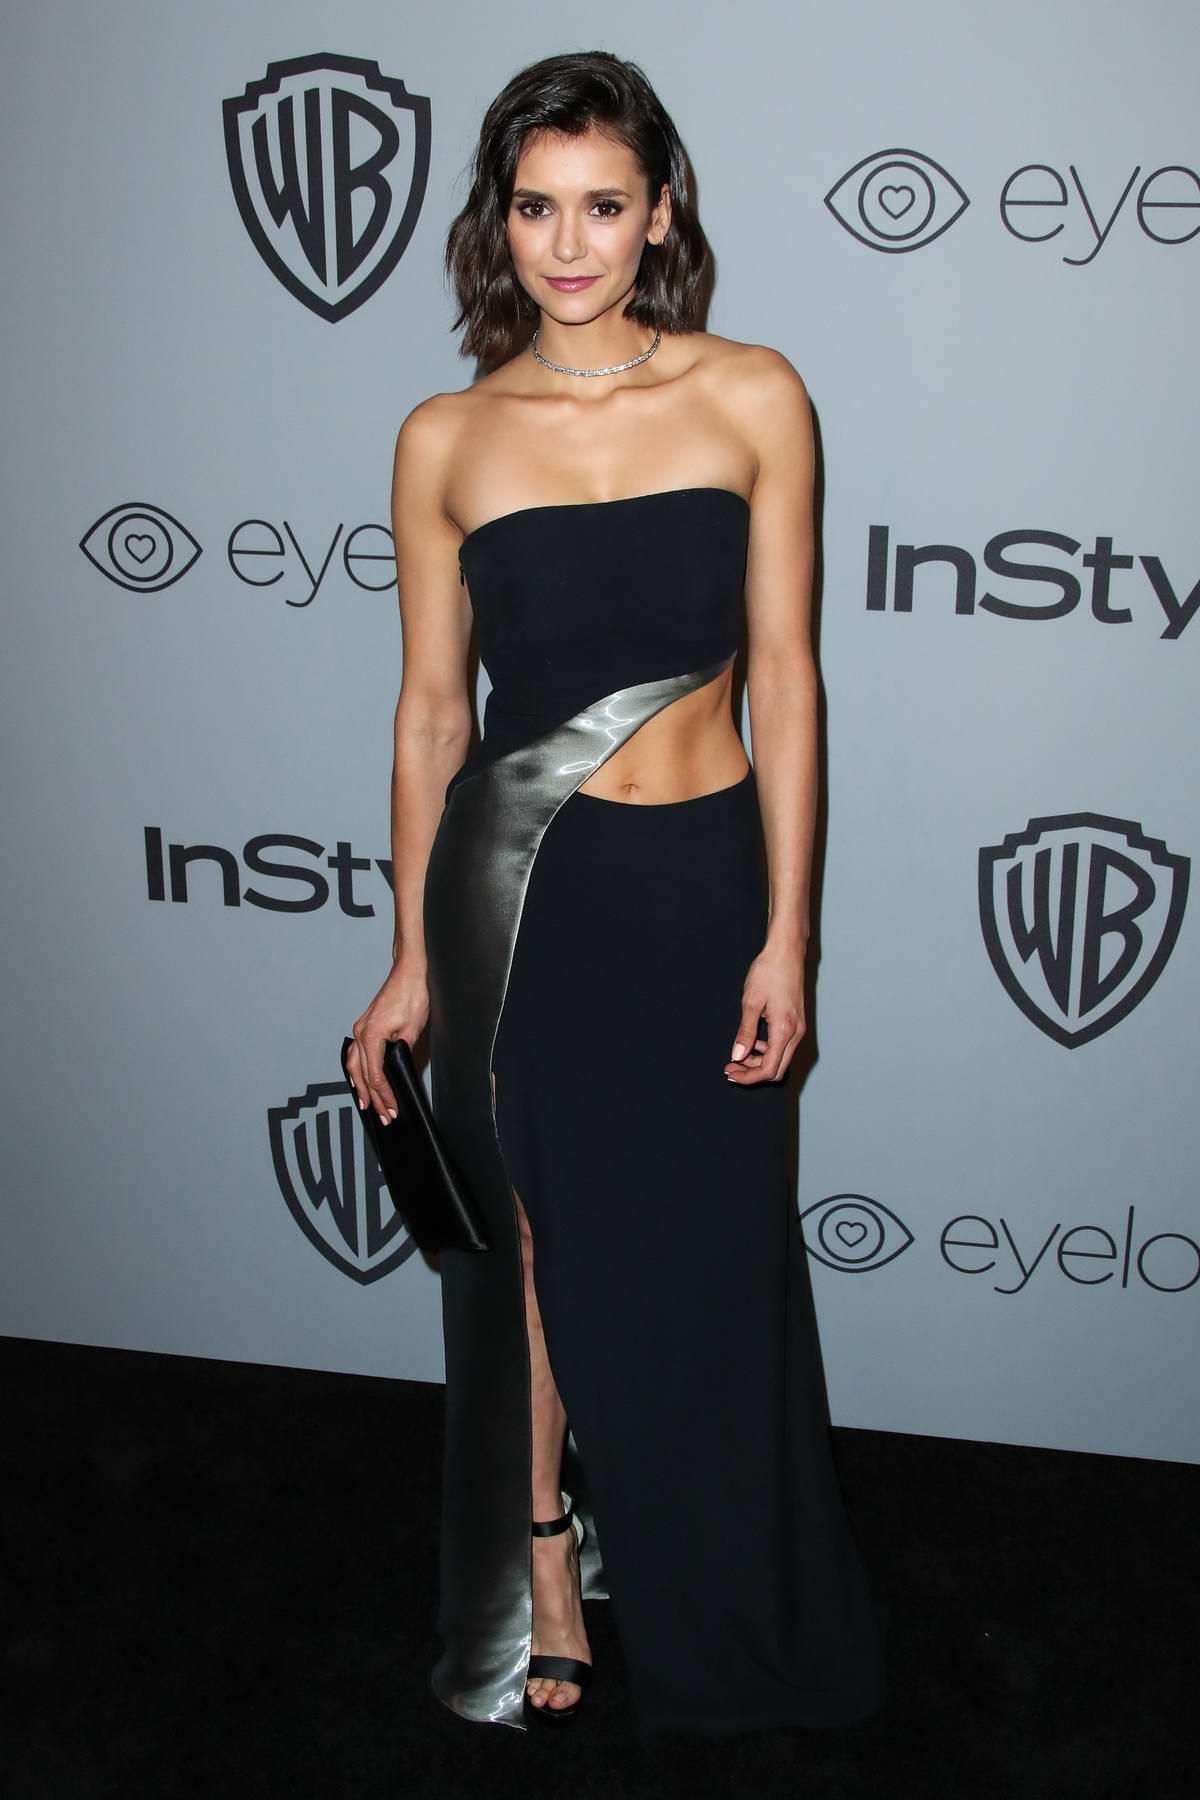 Nina Dobrev at Instyle & Warner Bros Golden Globes after party in Los Angeles